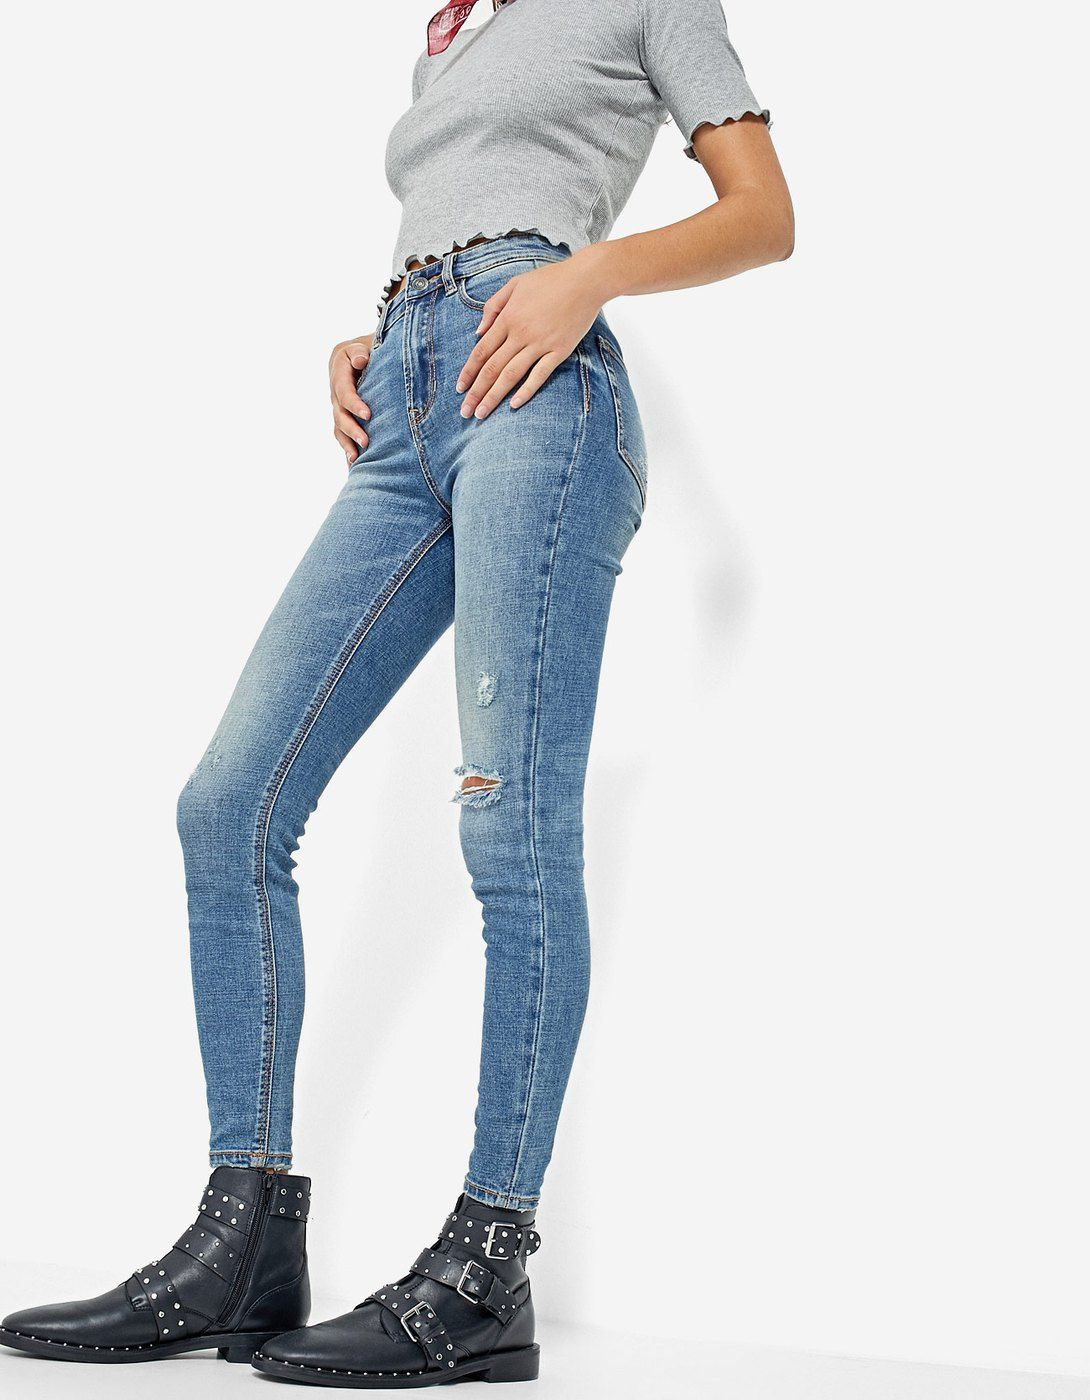 retro gran descuento salida de fábrica Denim super high waist - Jeans | Stradivarius España | En ...